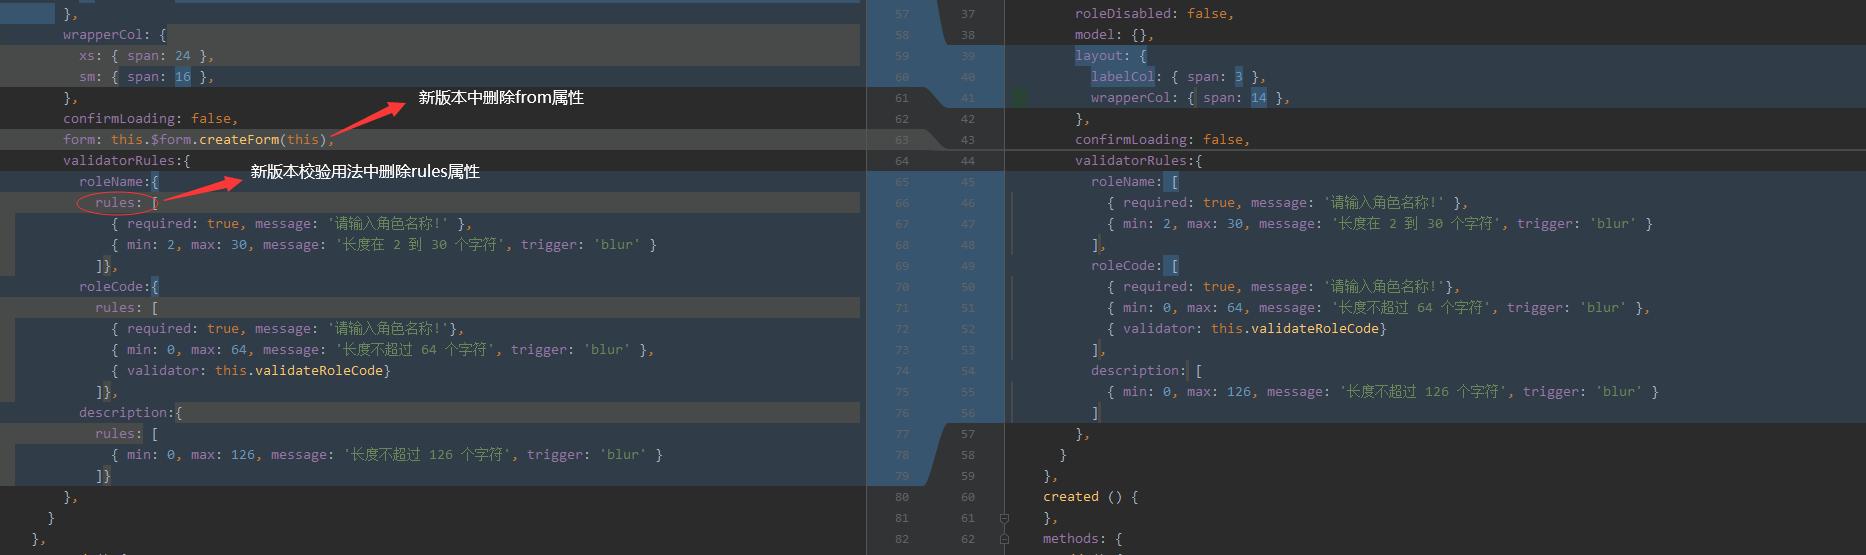 JeecgBoot的前端Form升级为FormModel用法(支持 v-model 绑定)(图3)